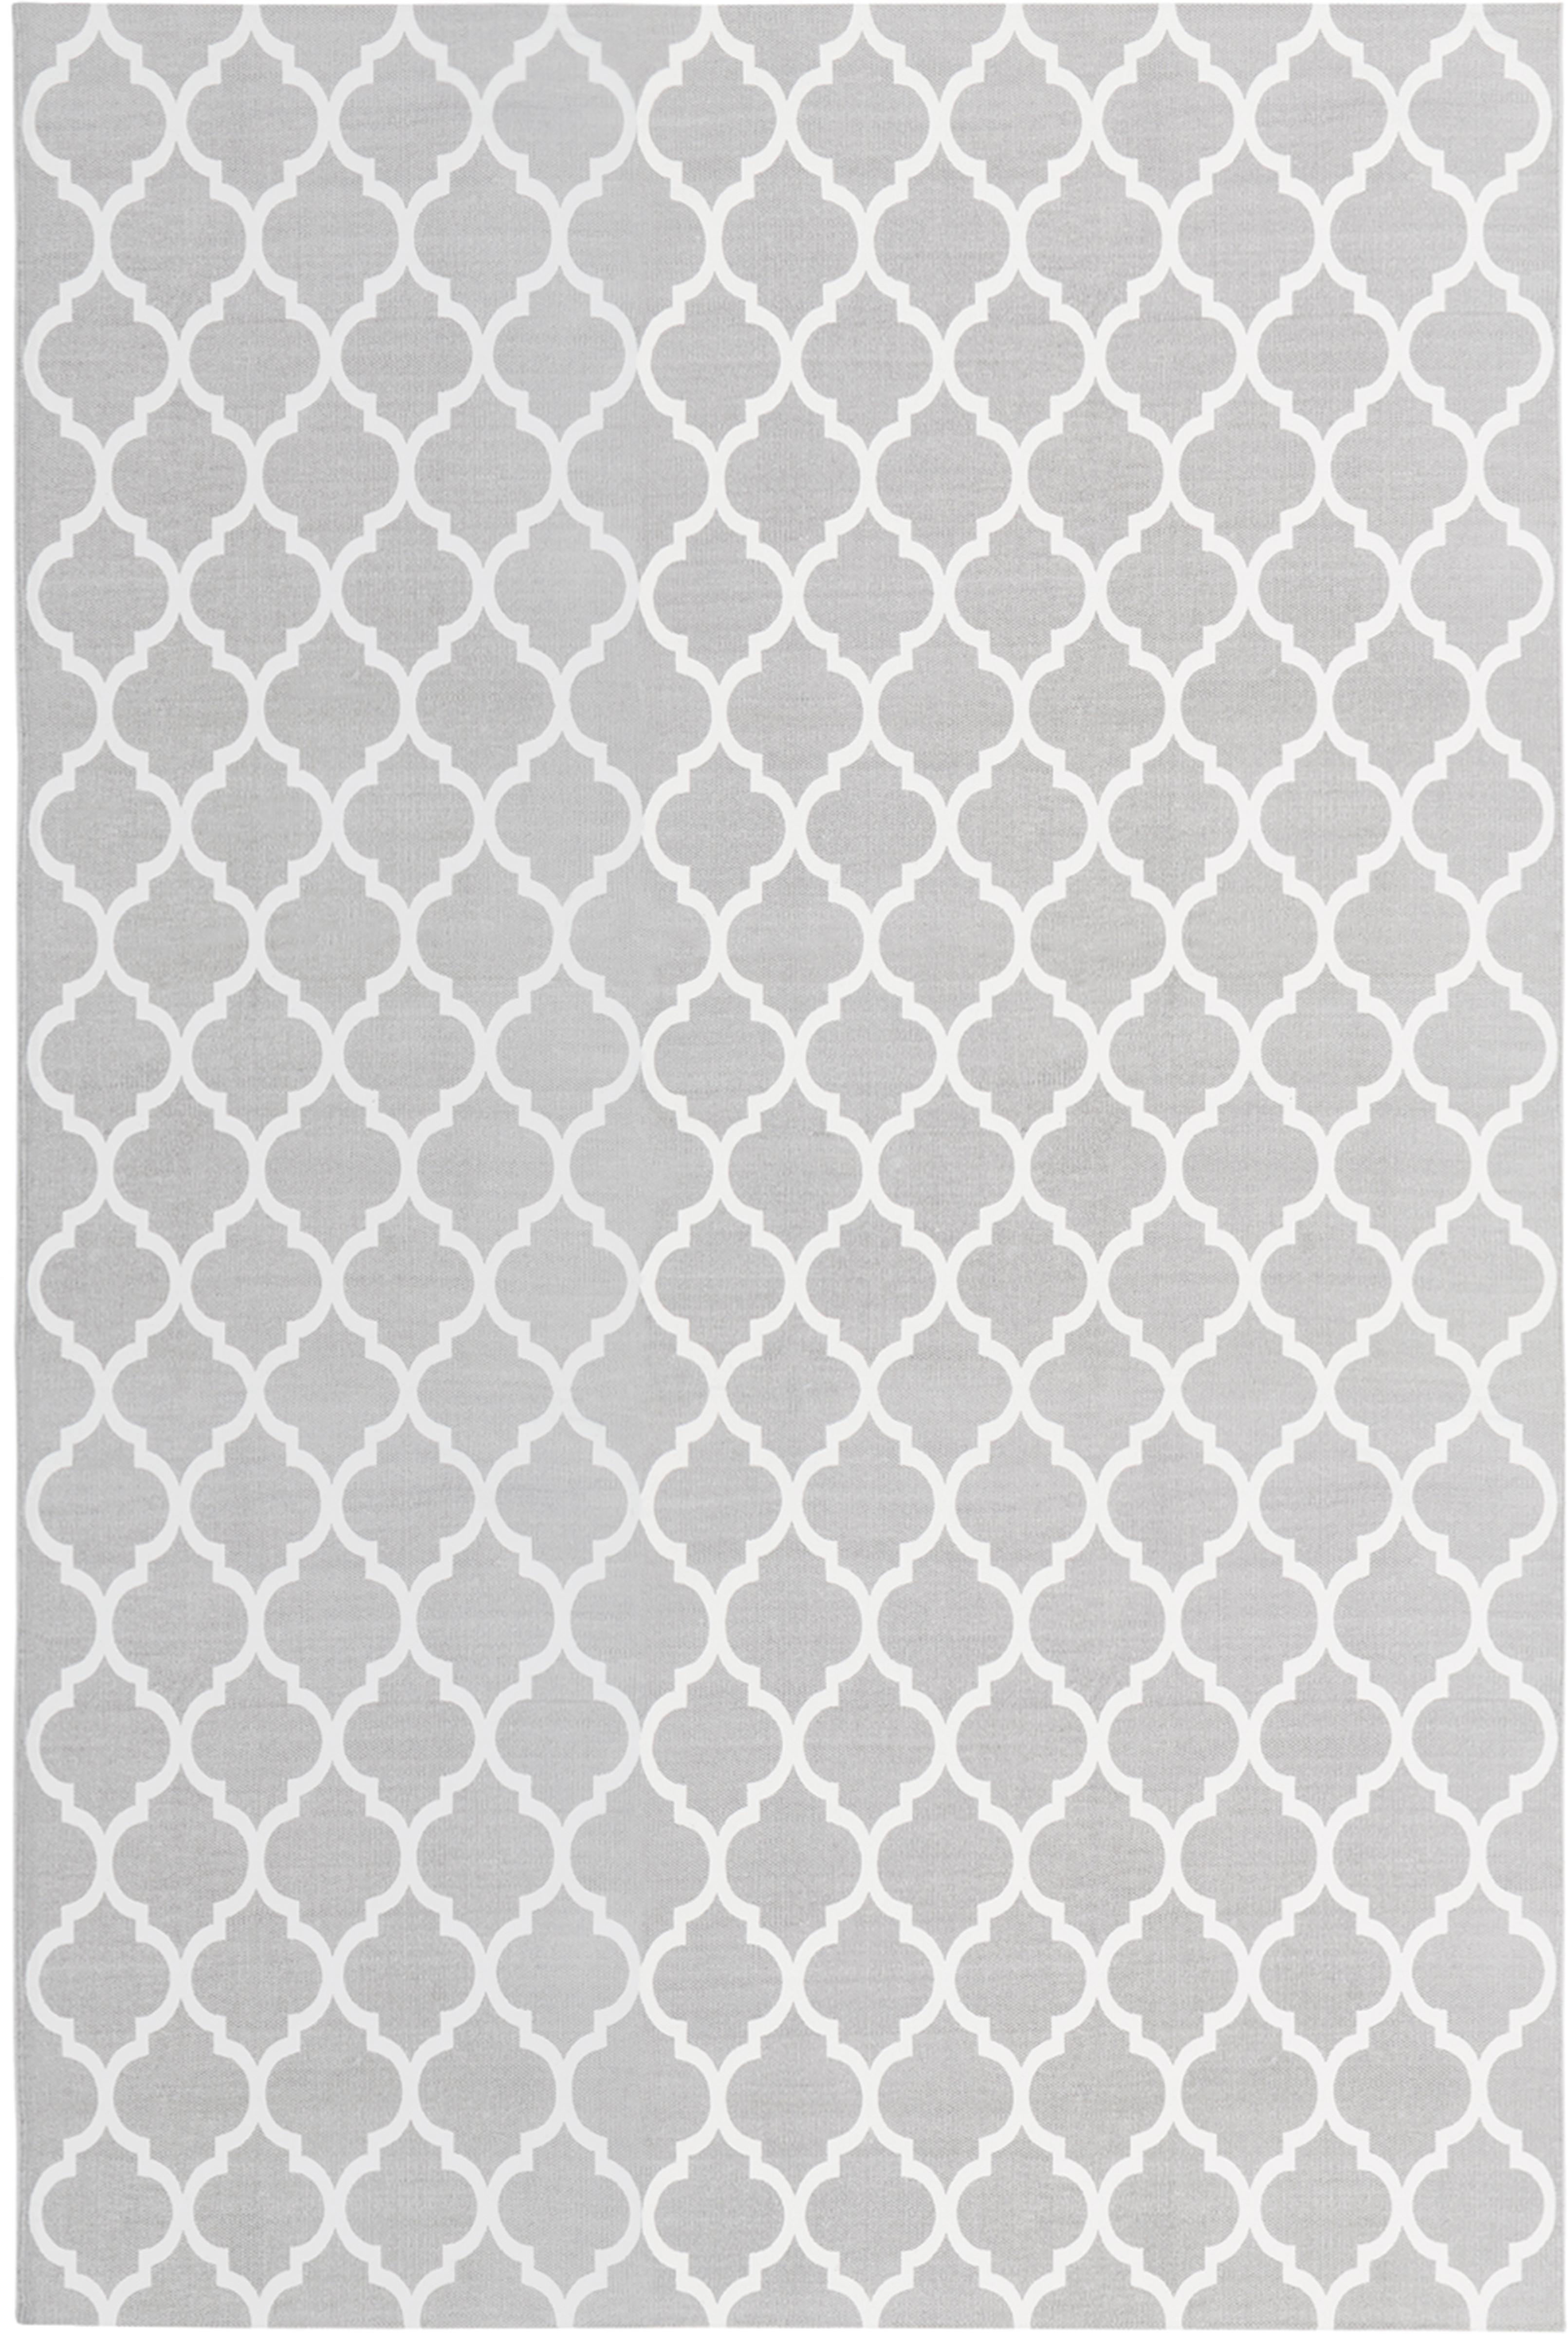 Flachgewebter Baumwollteppich Amira in Grau/Weiß, 100% Baumwolle, Hellgrau, Cremeweiß, B 200 x L 300 cm (Größe L)